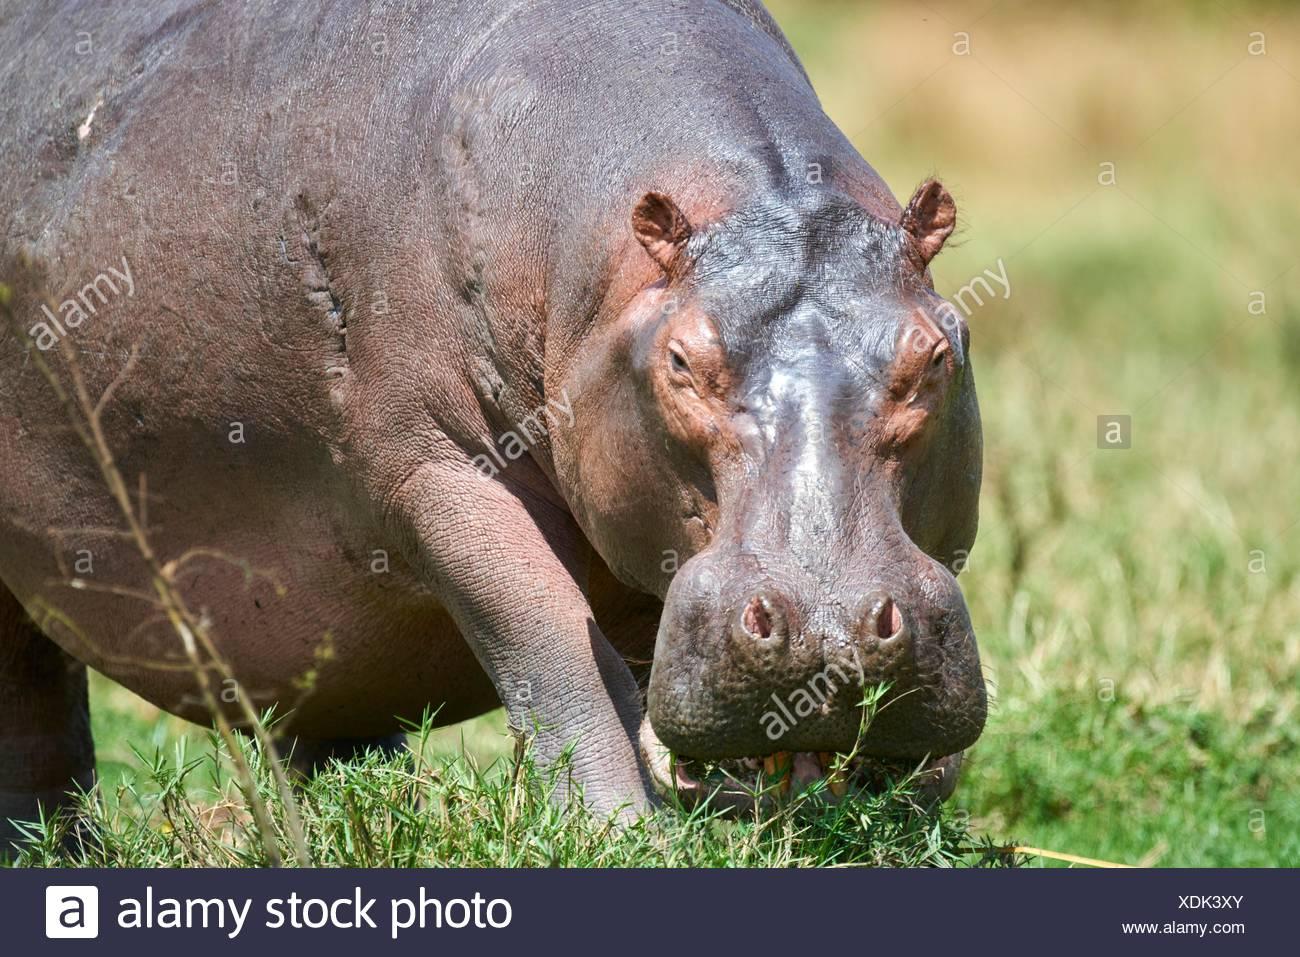 Hippopotamus grazing (Hippopotamus amphibius) Murchisson Falls National Park, Uganda. Stock Photo